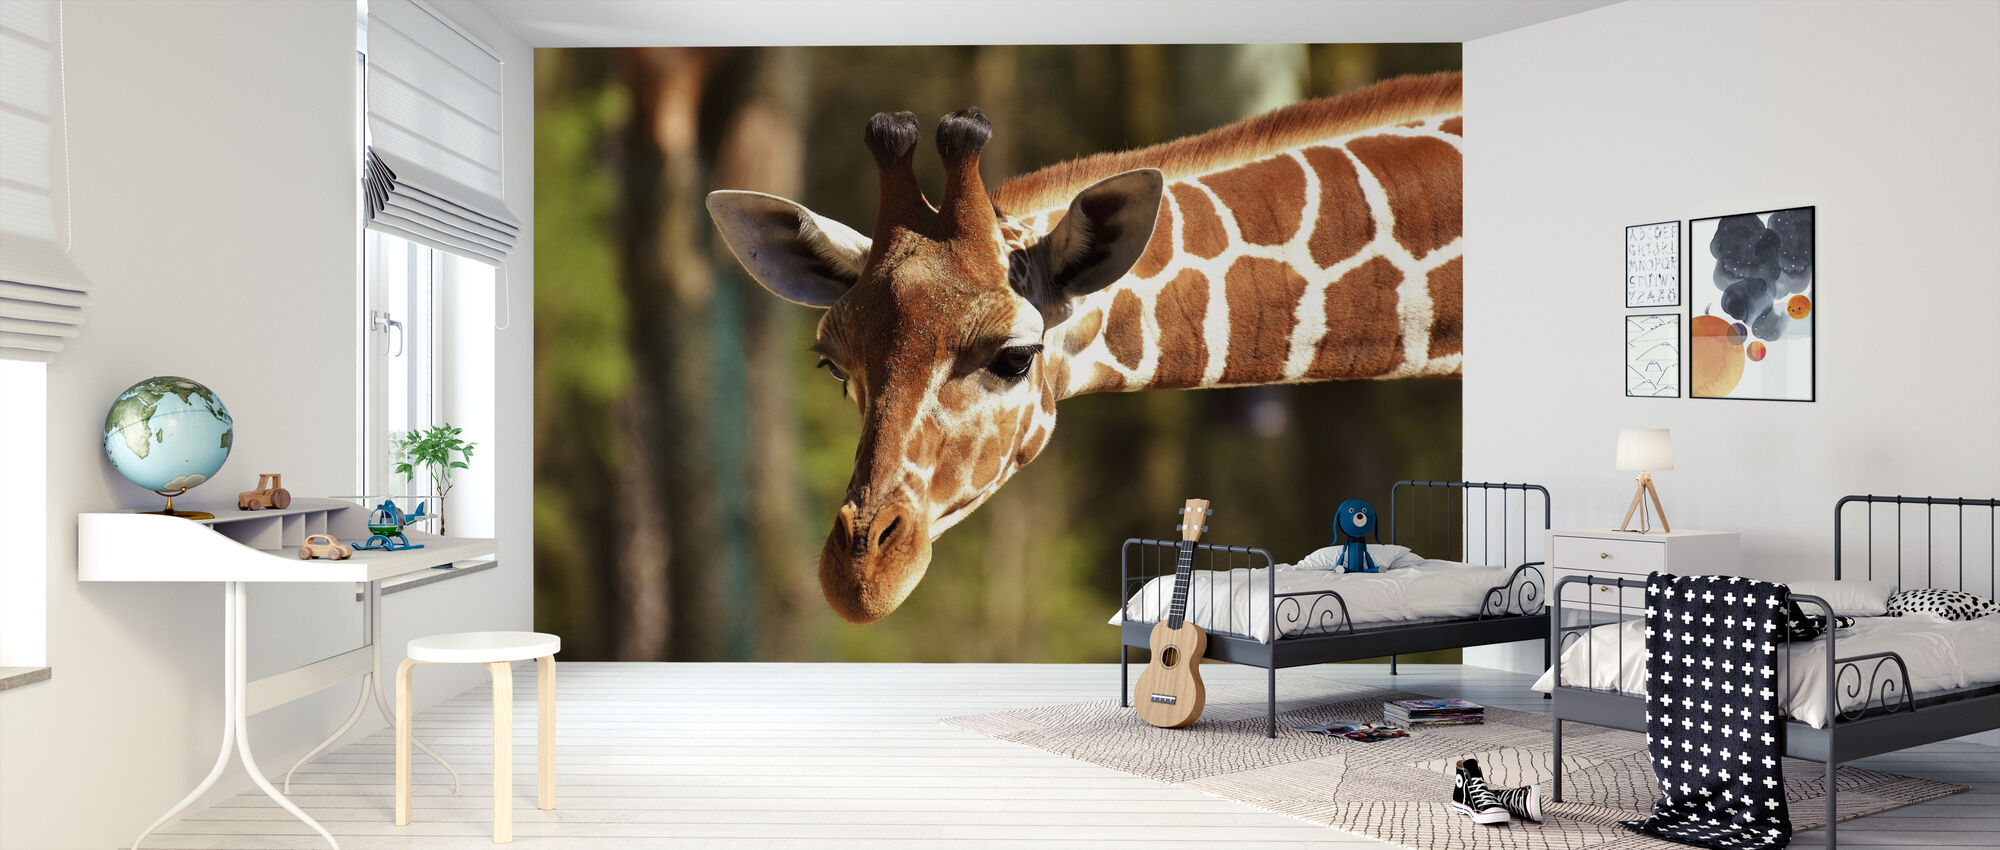 Giraffe in the Wild - Wallpaper - Kids Room